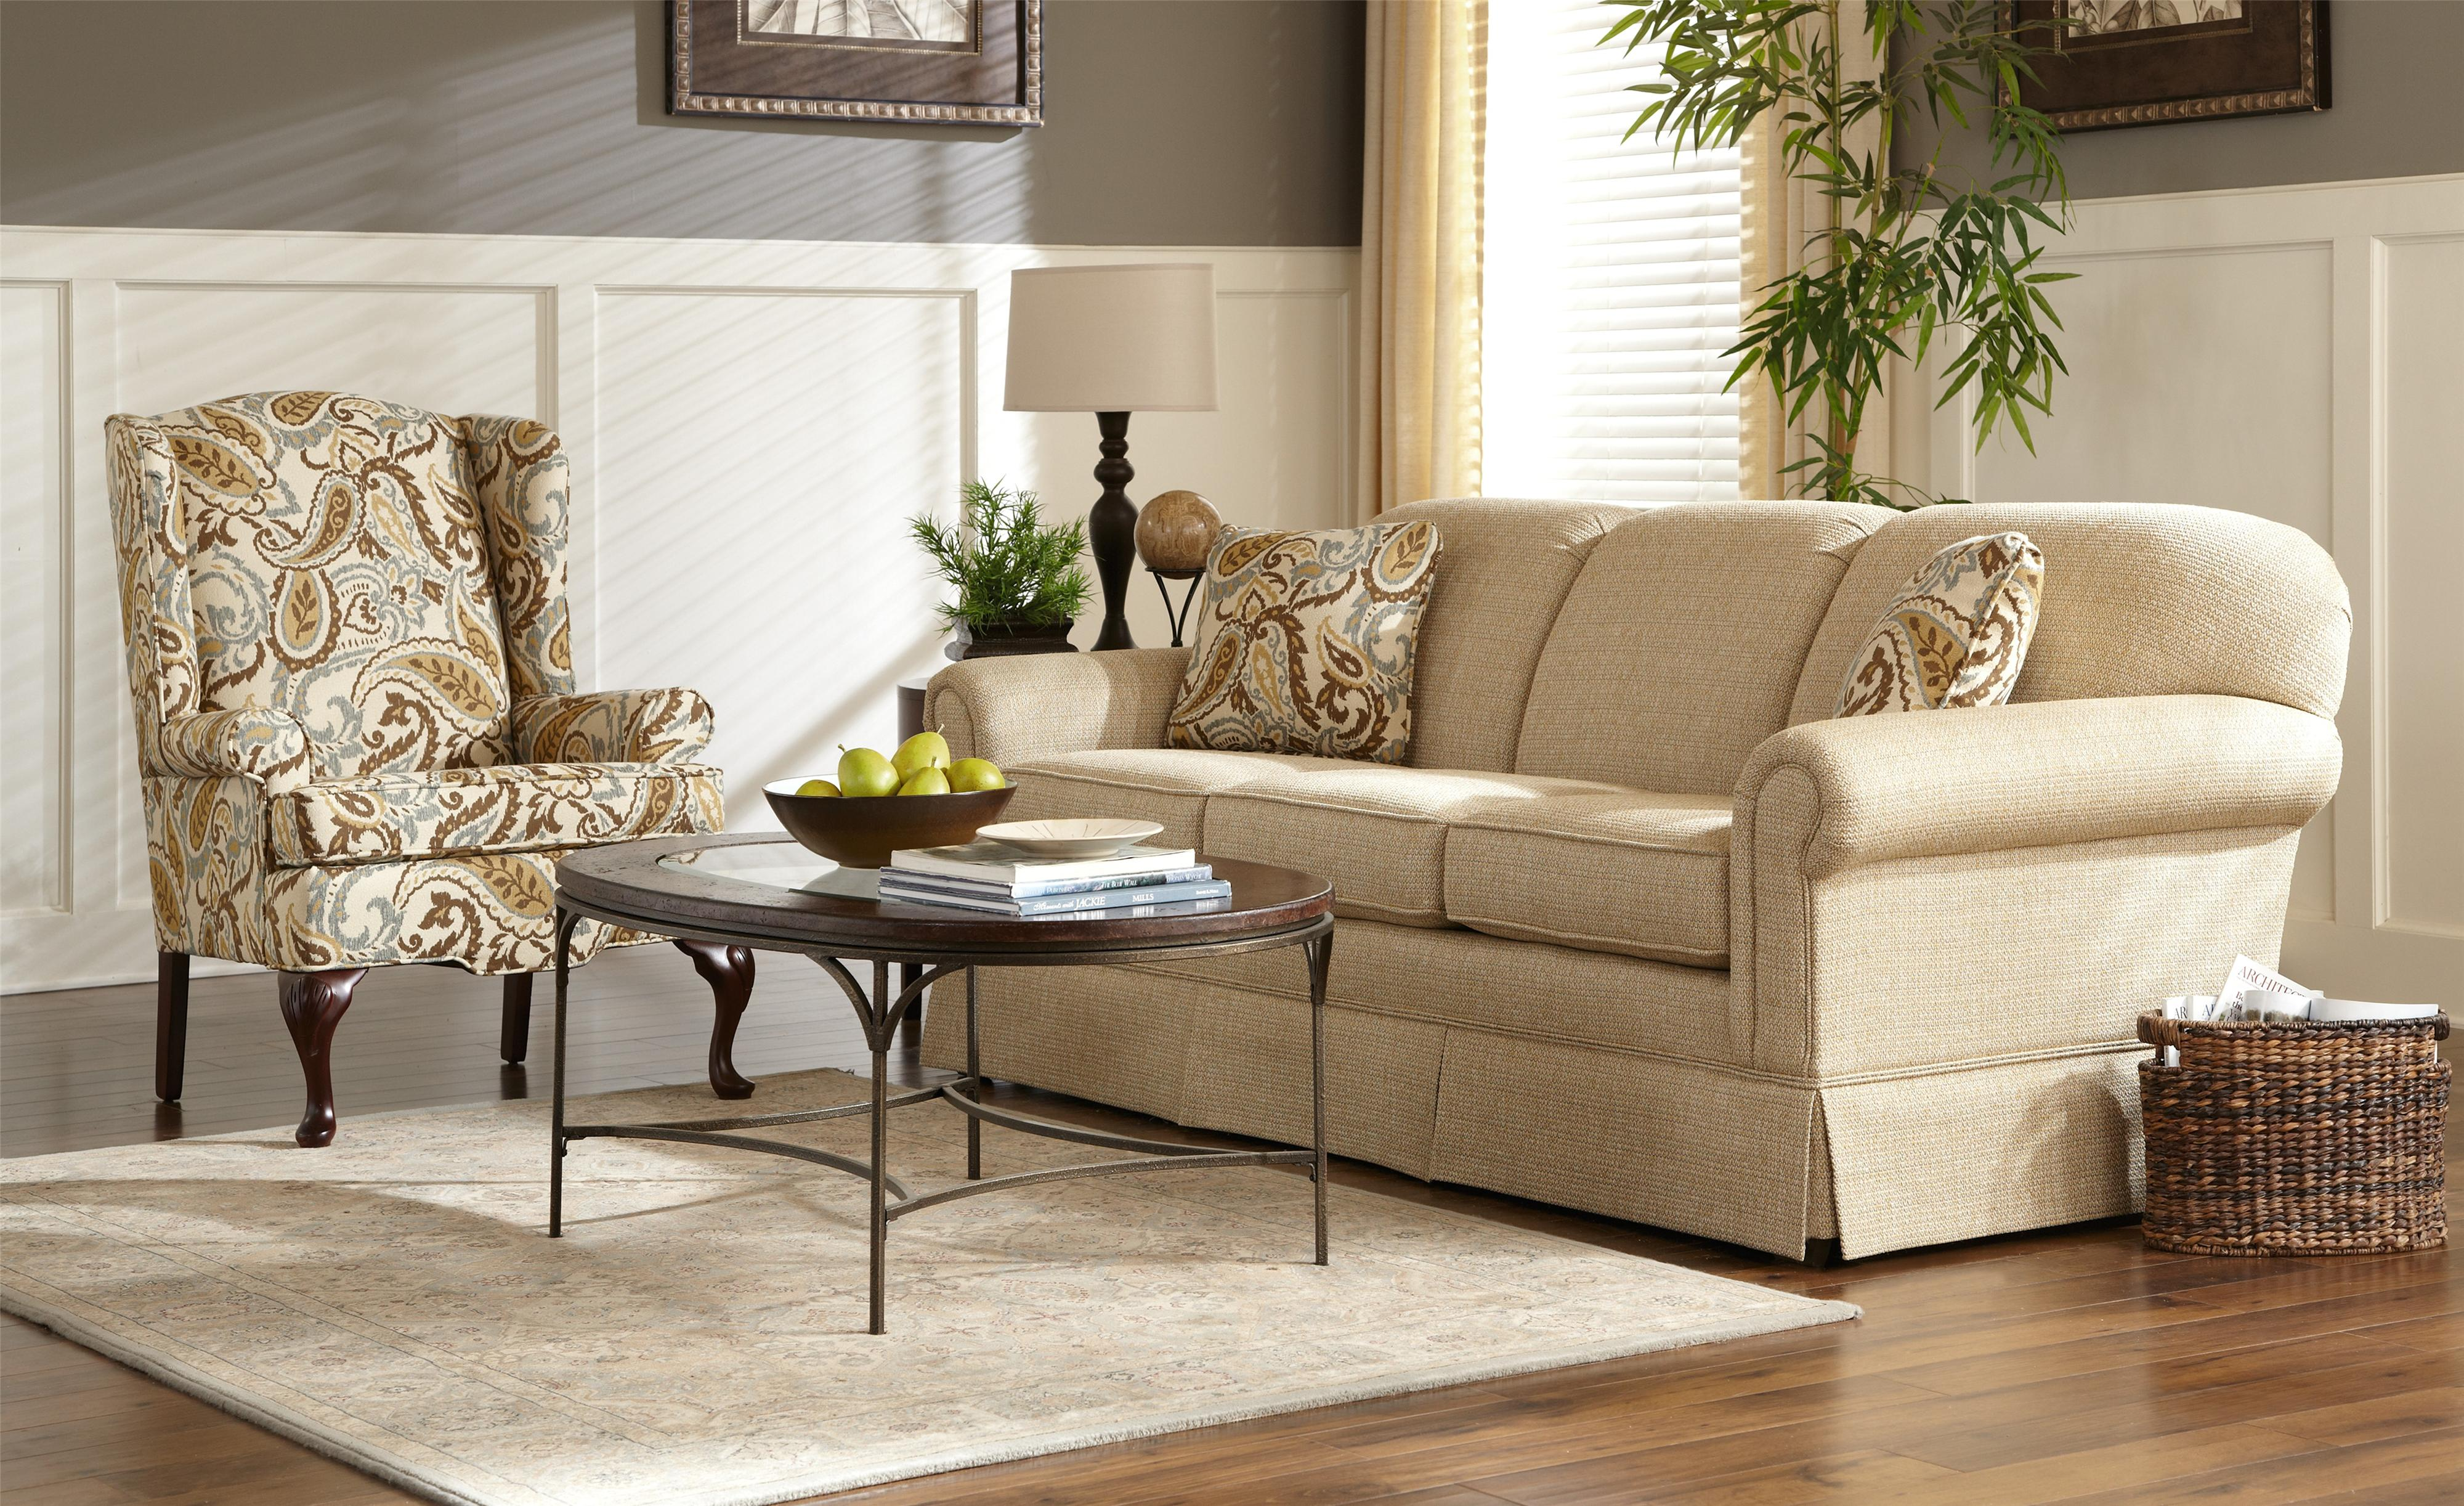 4200 Stationary Living Room Group by Craftmaster at Bullard Furniture